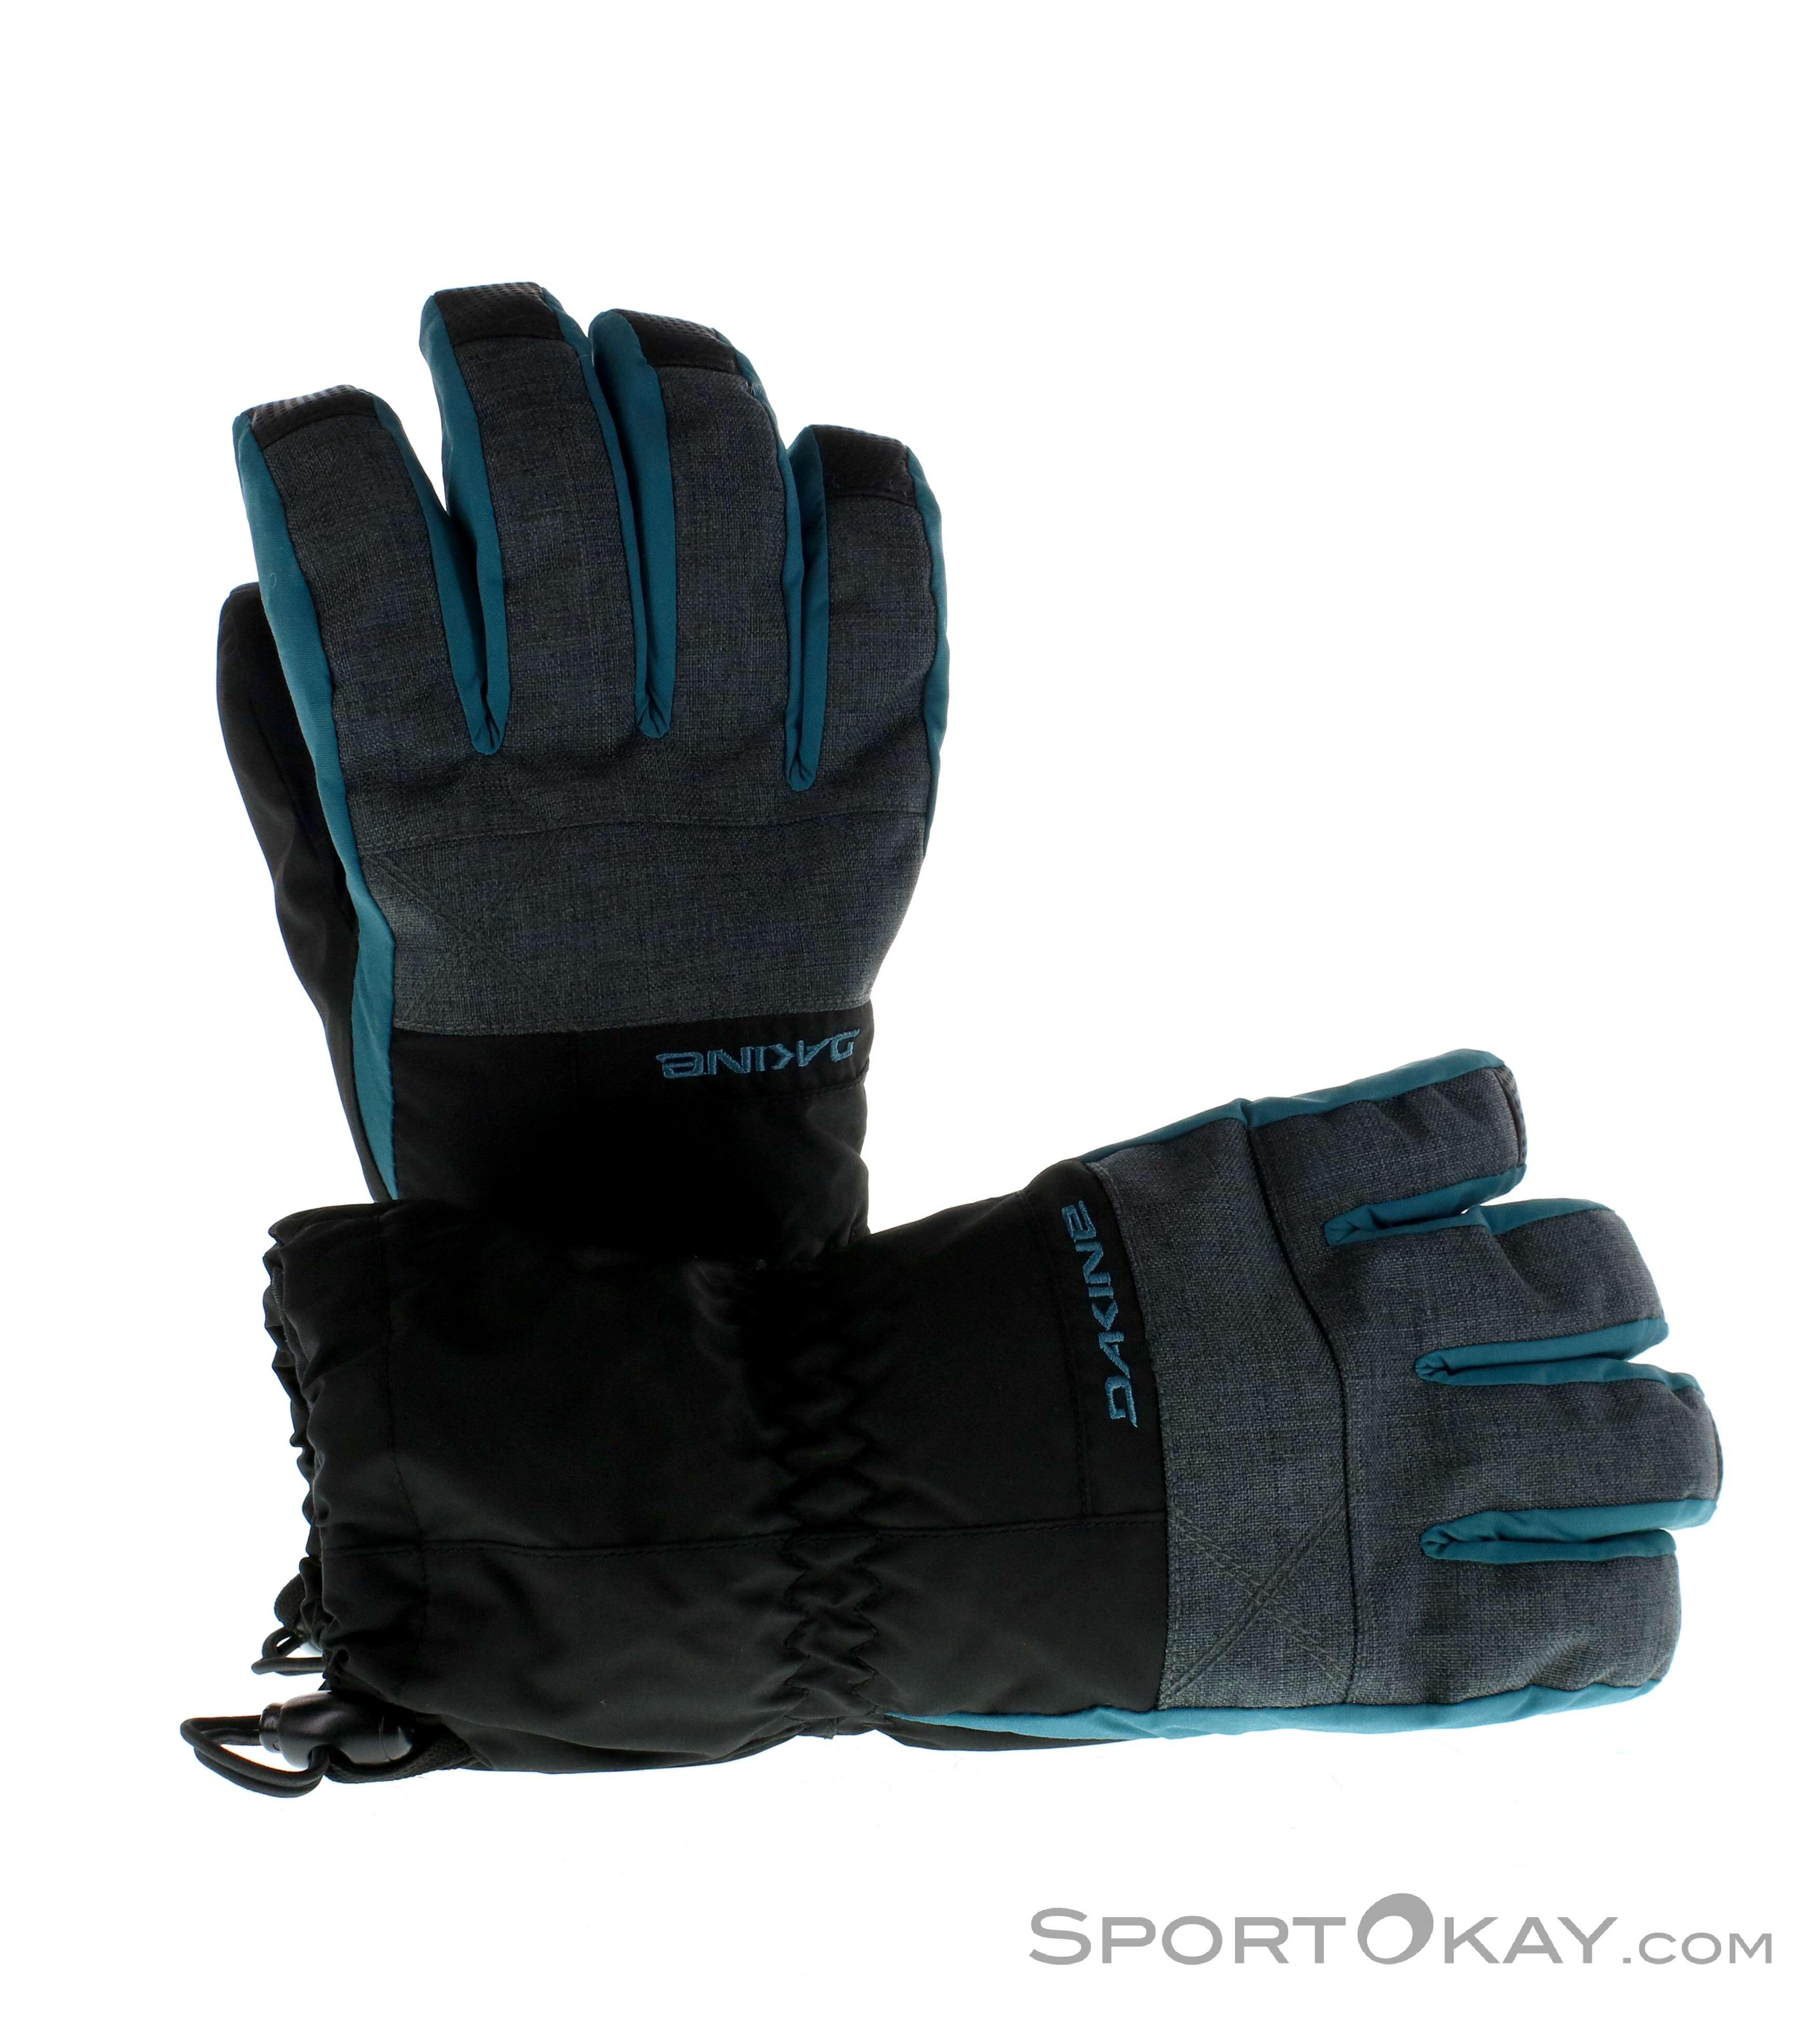 Dakine Avenger Mitt Kinder Handschuhe Gore-Tex-Schwarz-XL